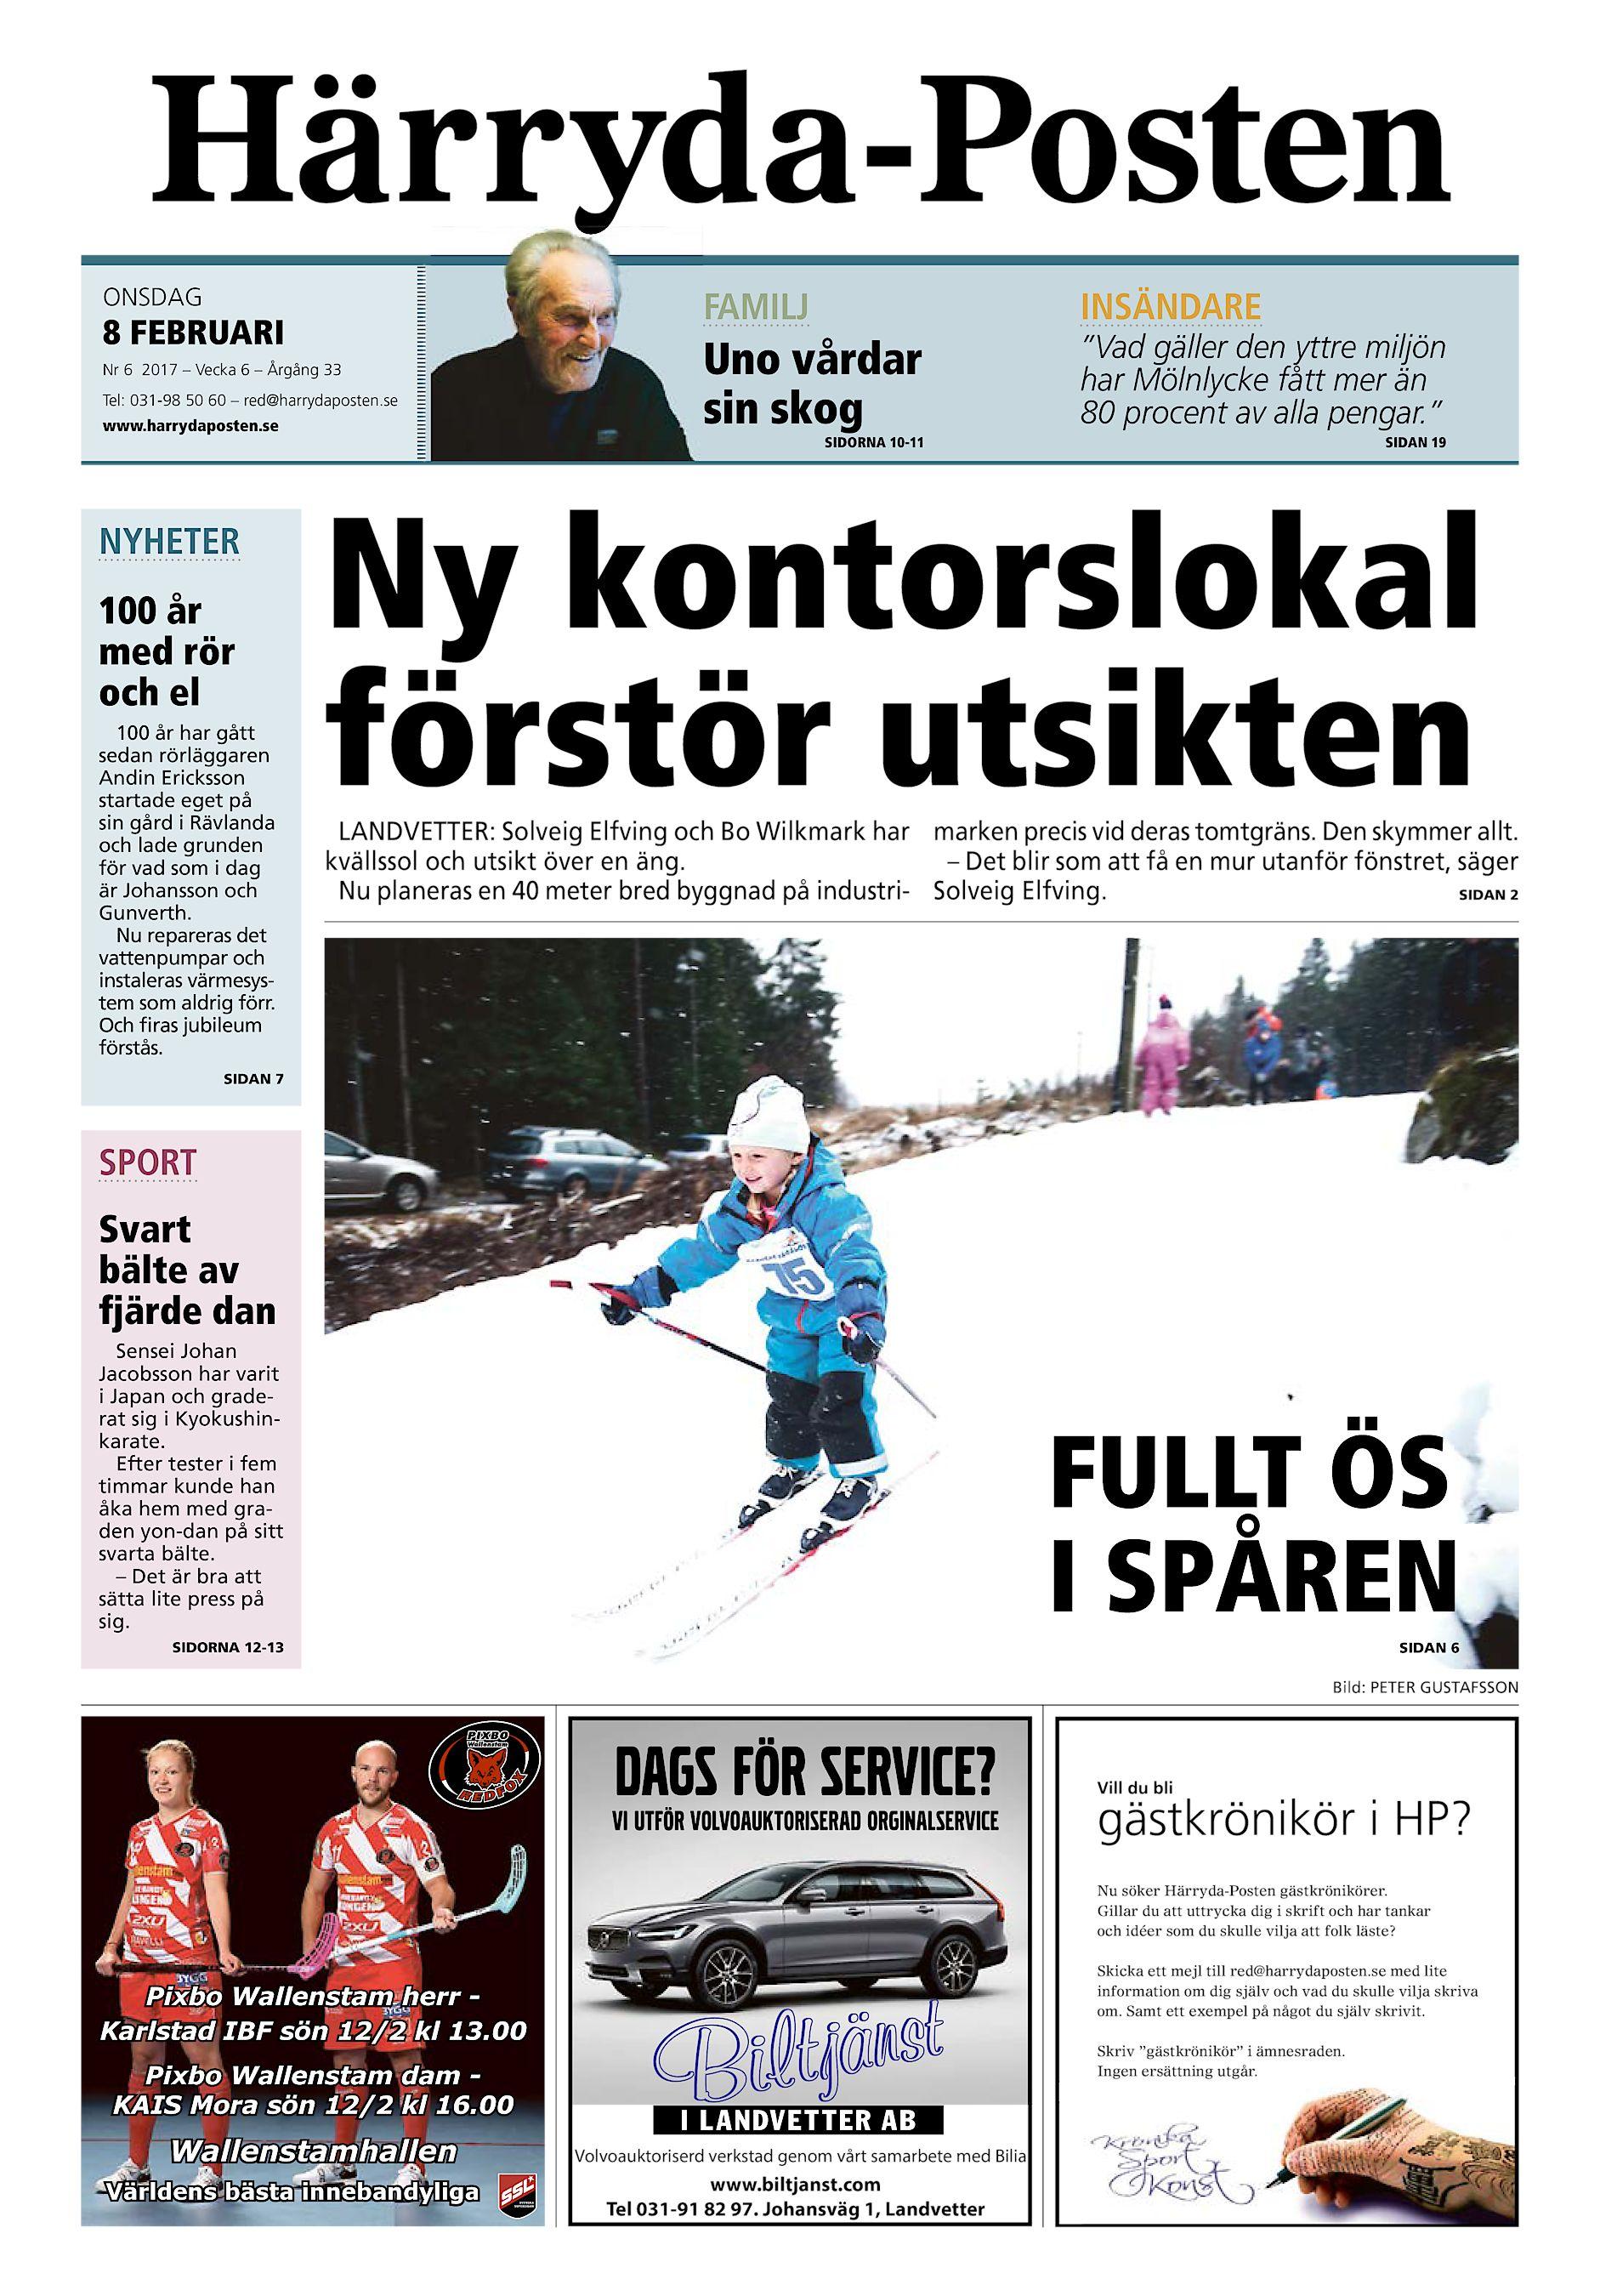 Daniel, Man, 41 | Landvetter, Sverige | Badoo